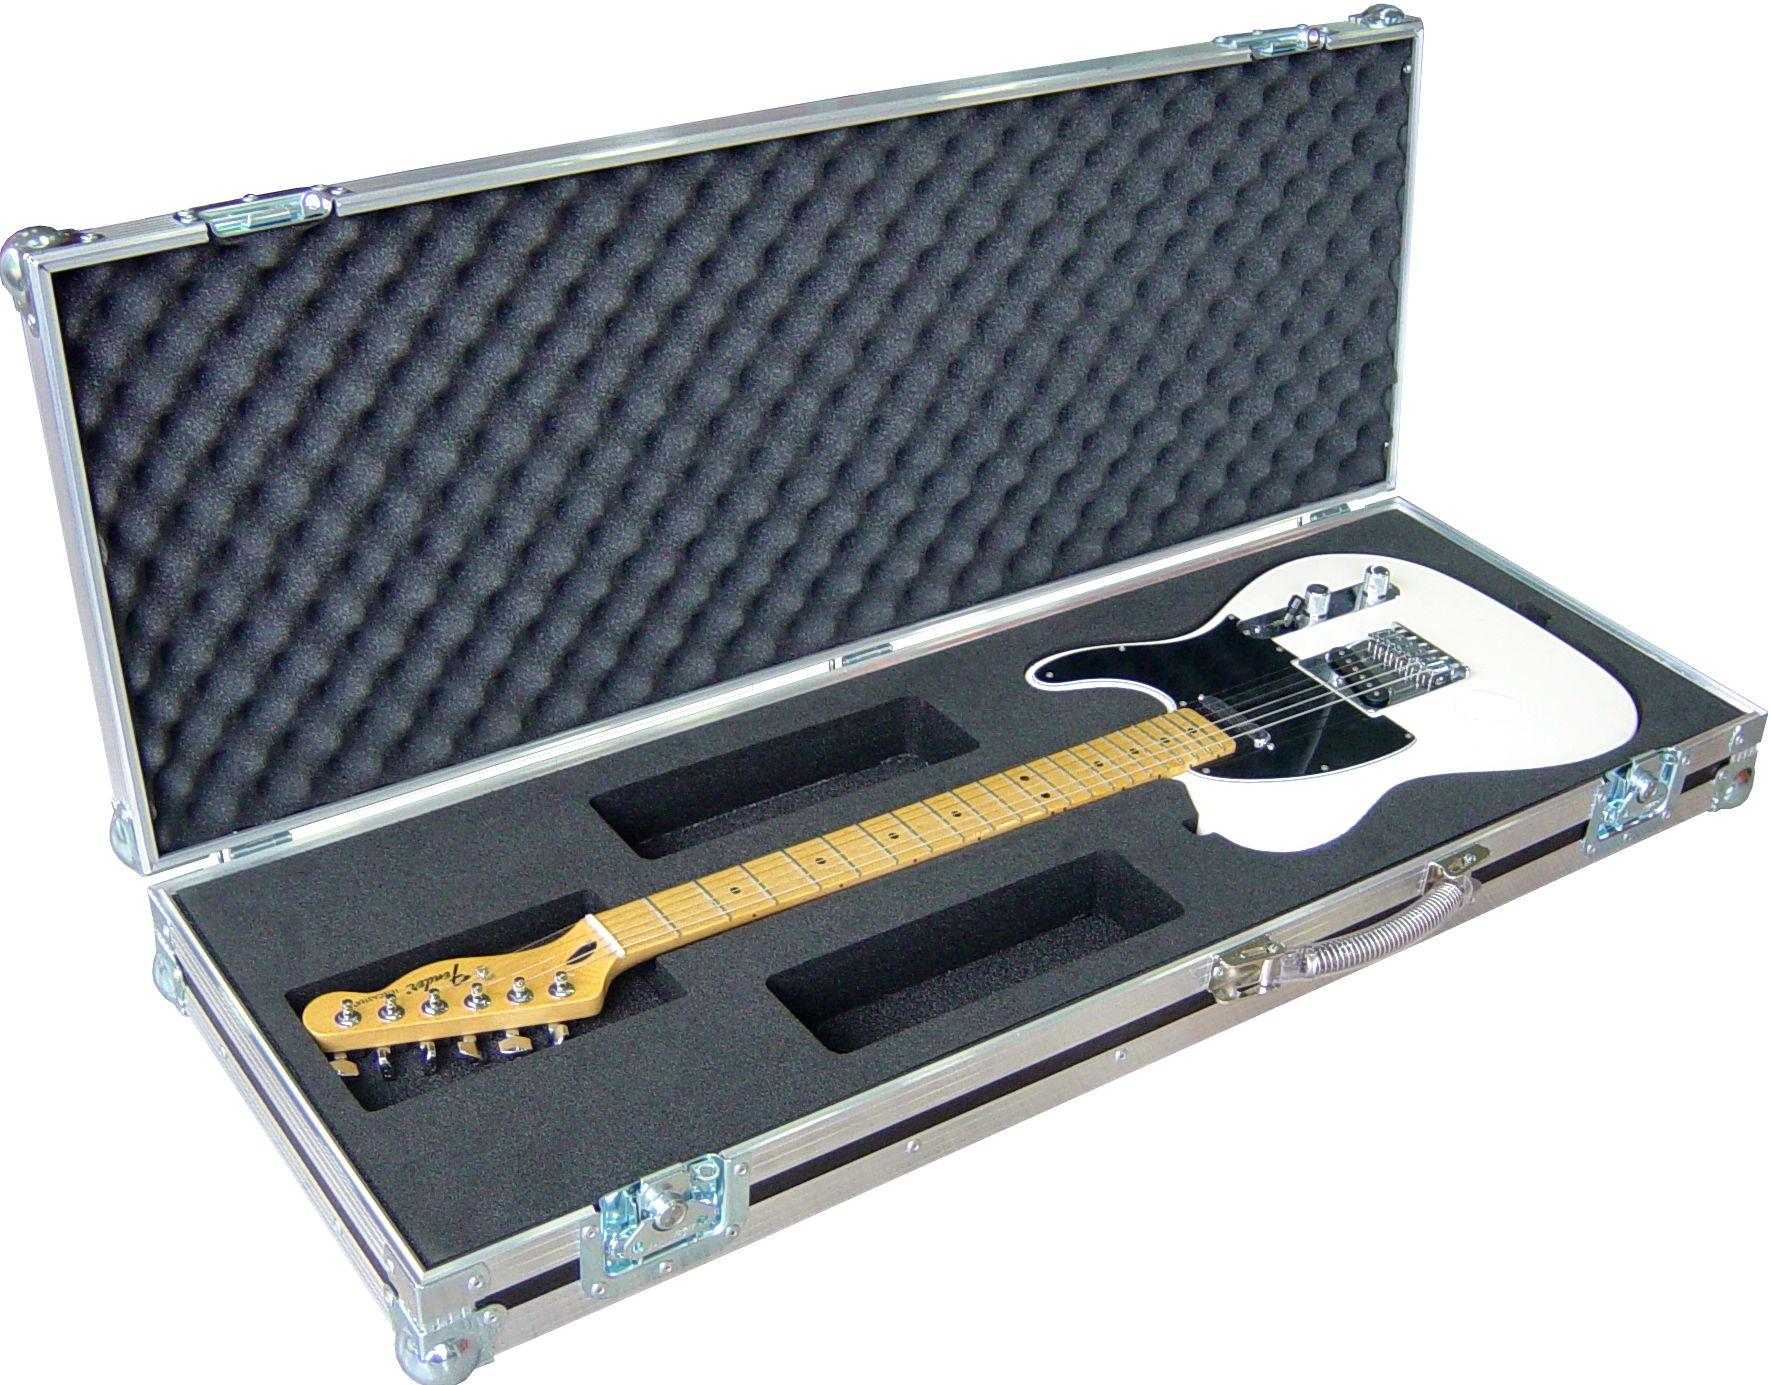 Guitar Flightcases